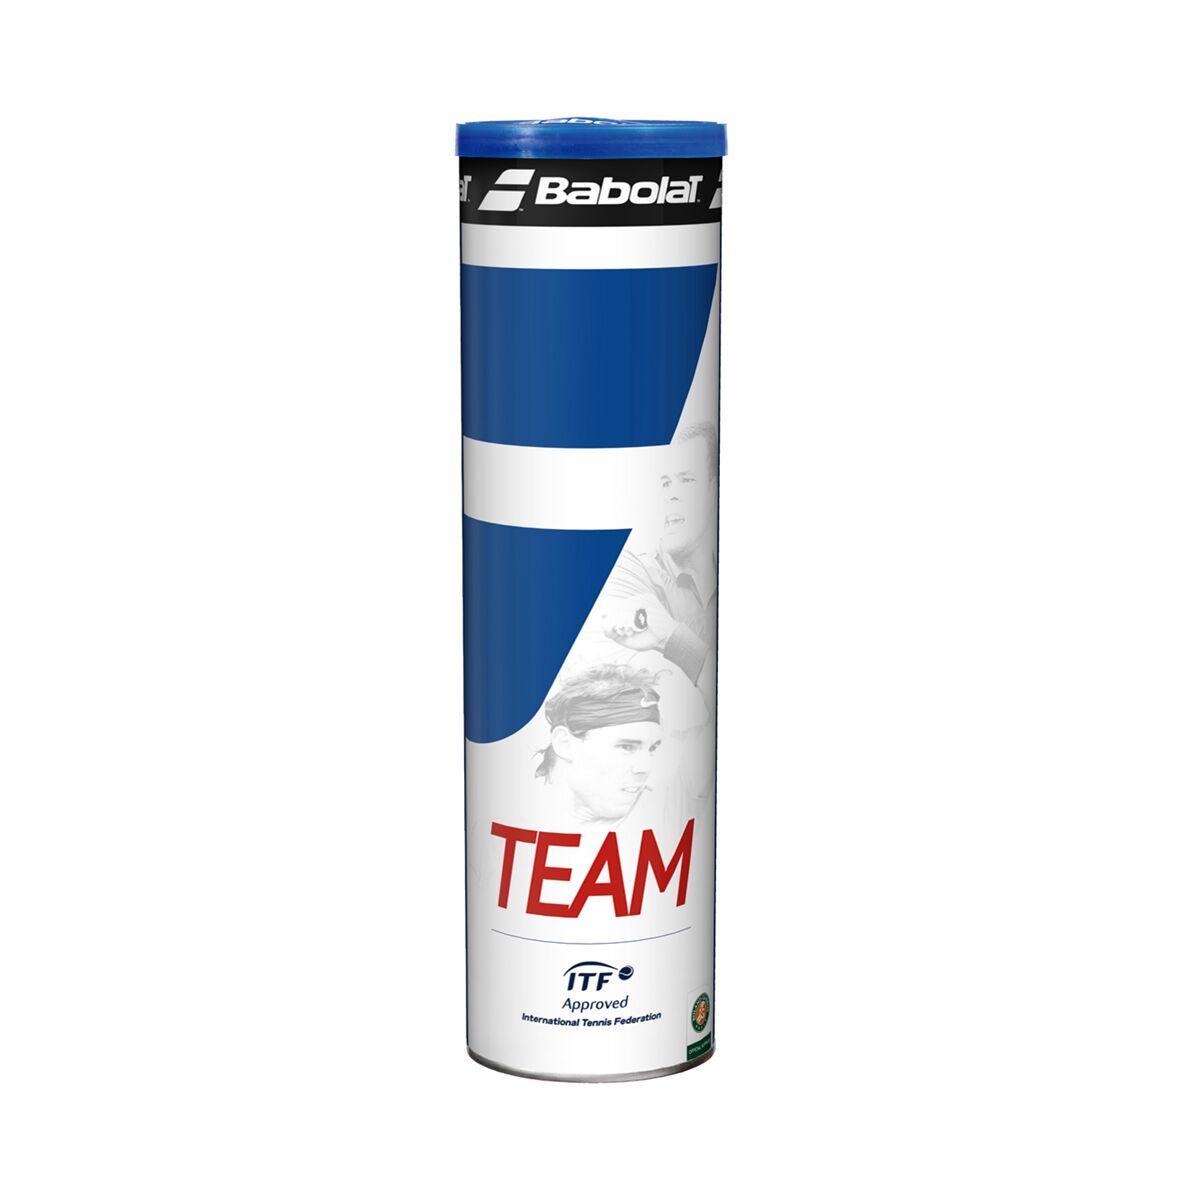 Babolat Team 18 tuubia